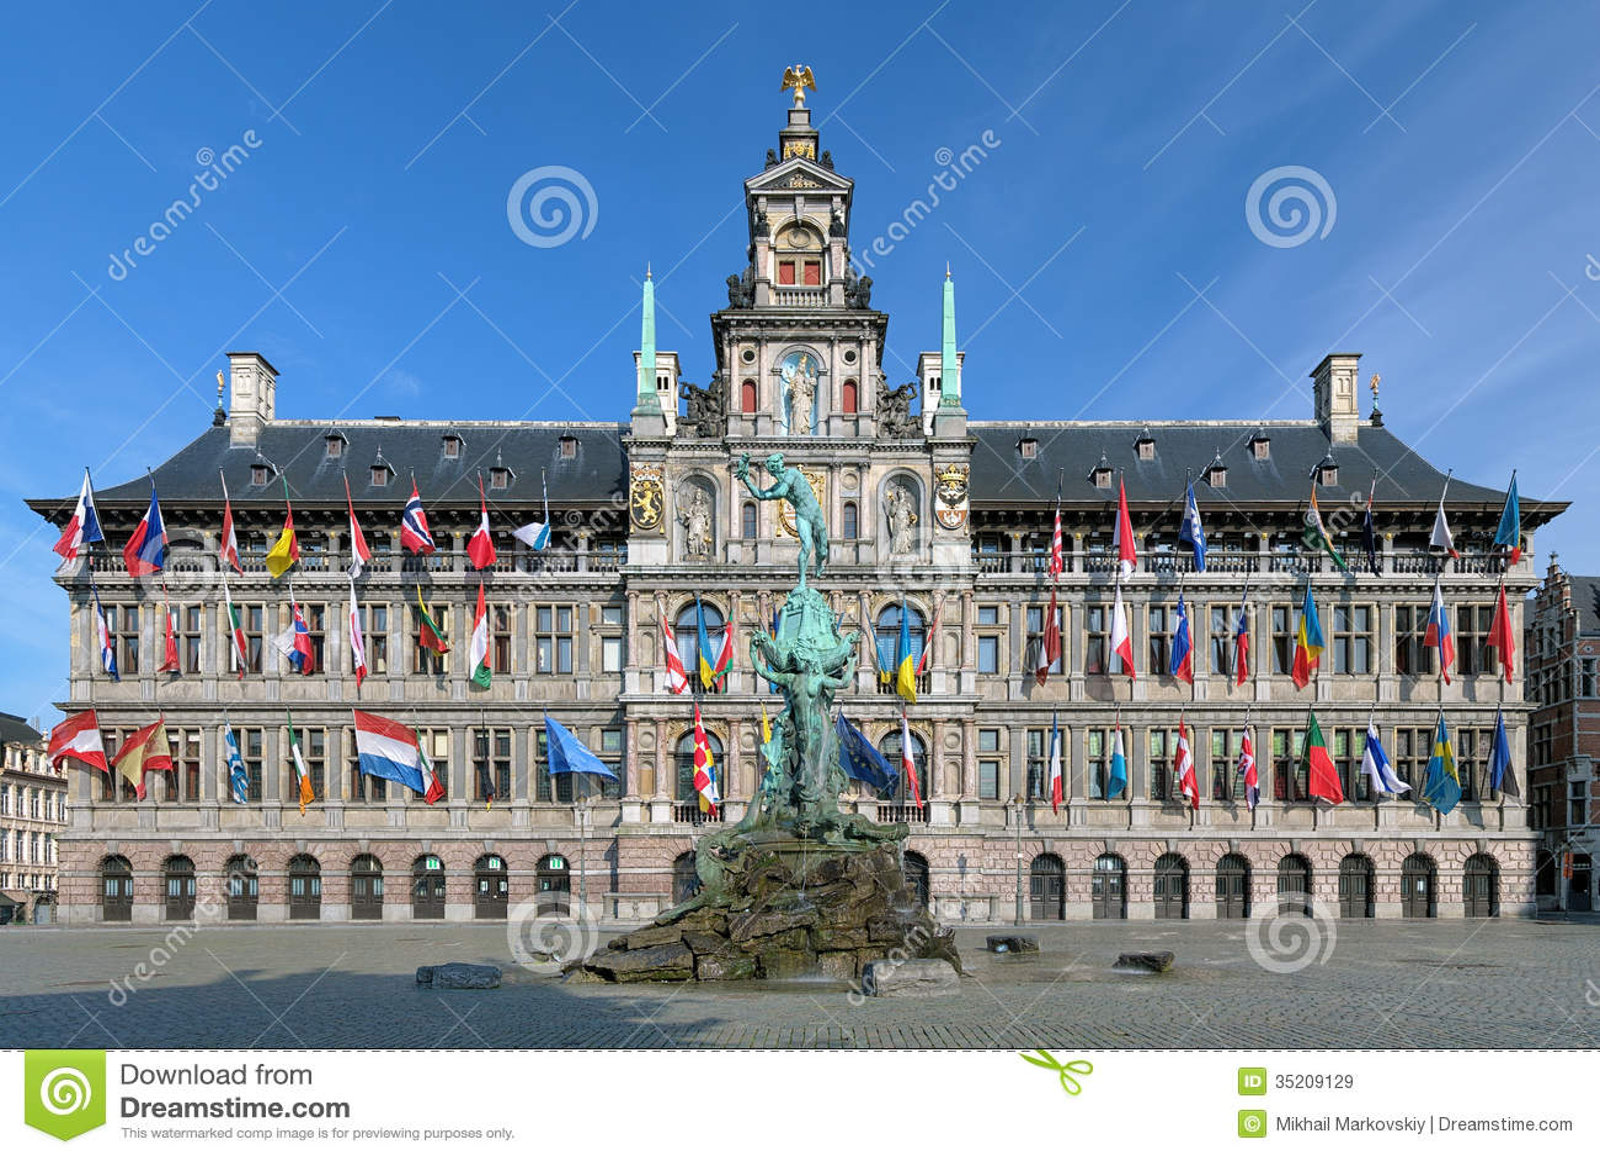 Antwerp Brabo i urzędu miasta fontanna, Belgia